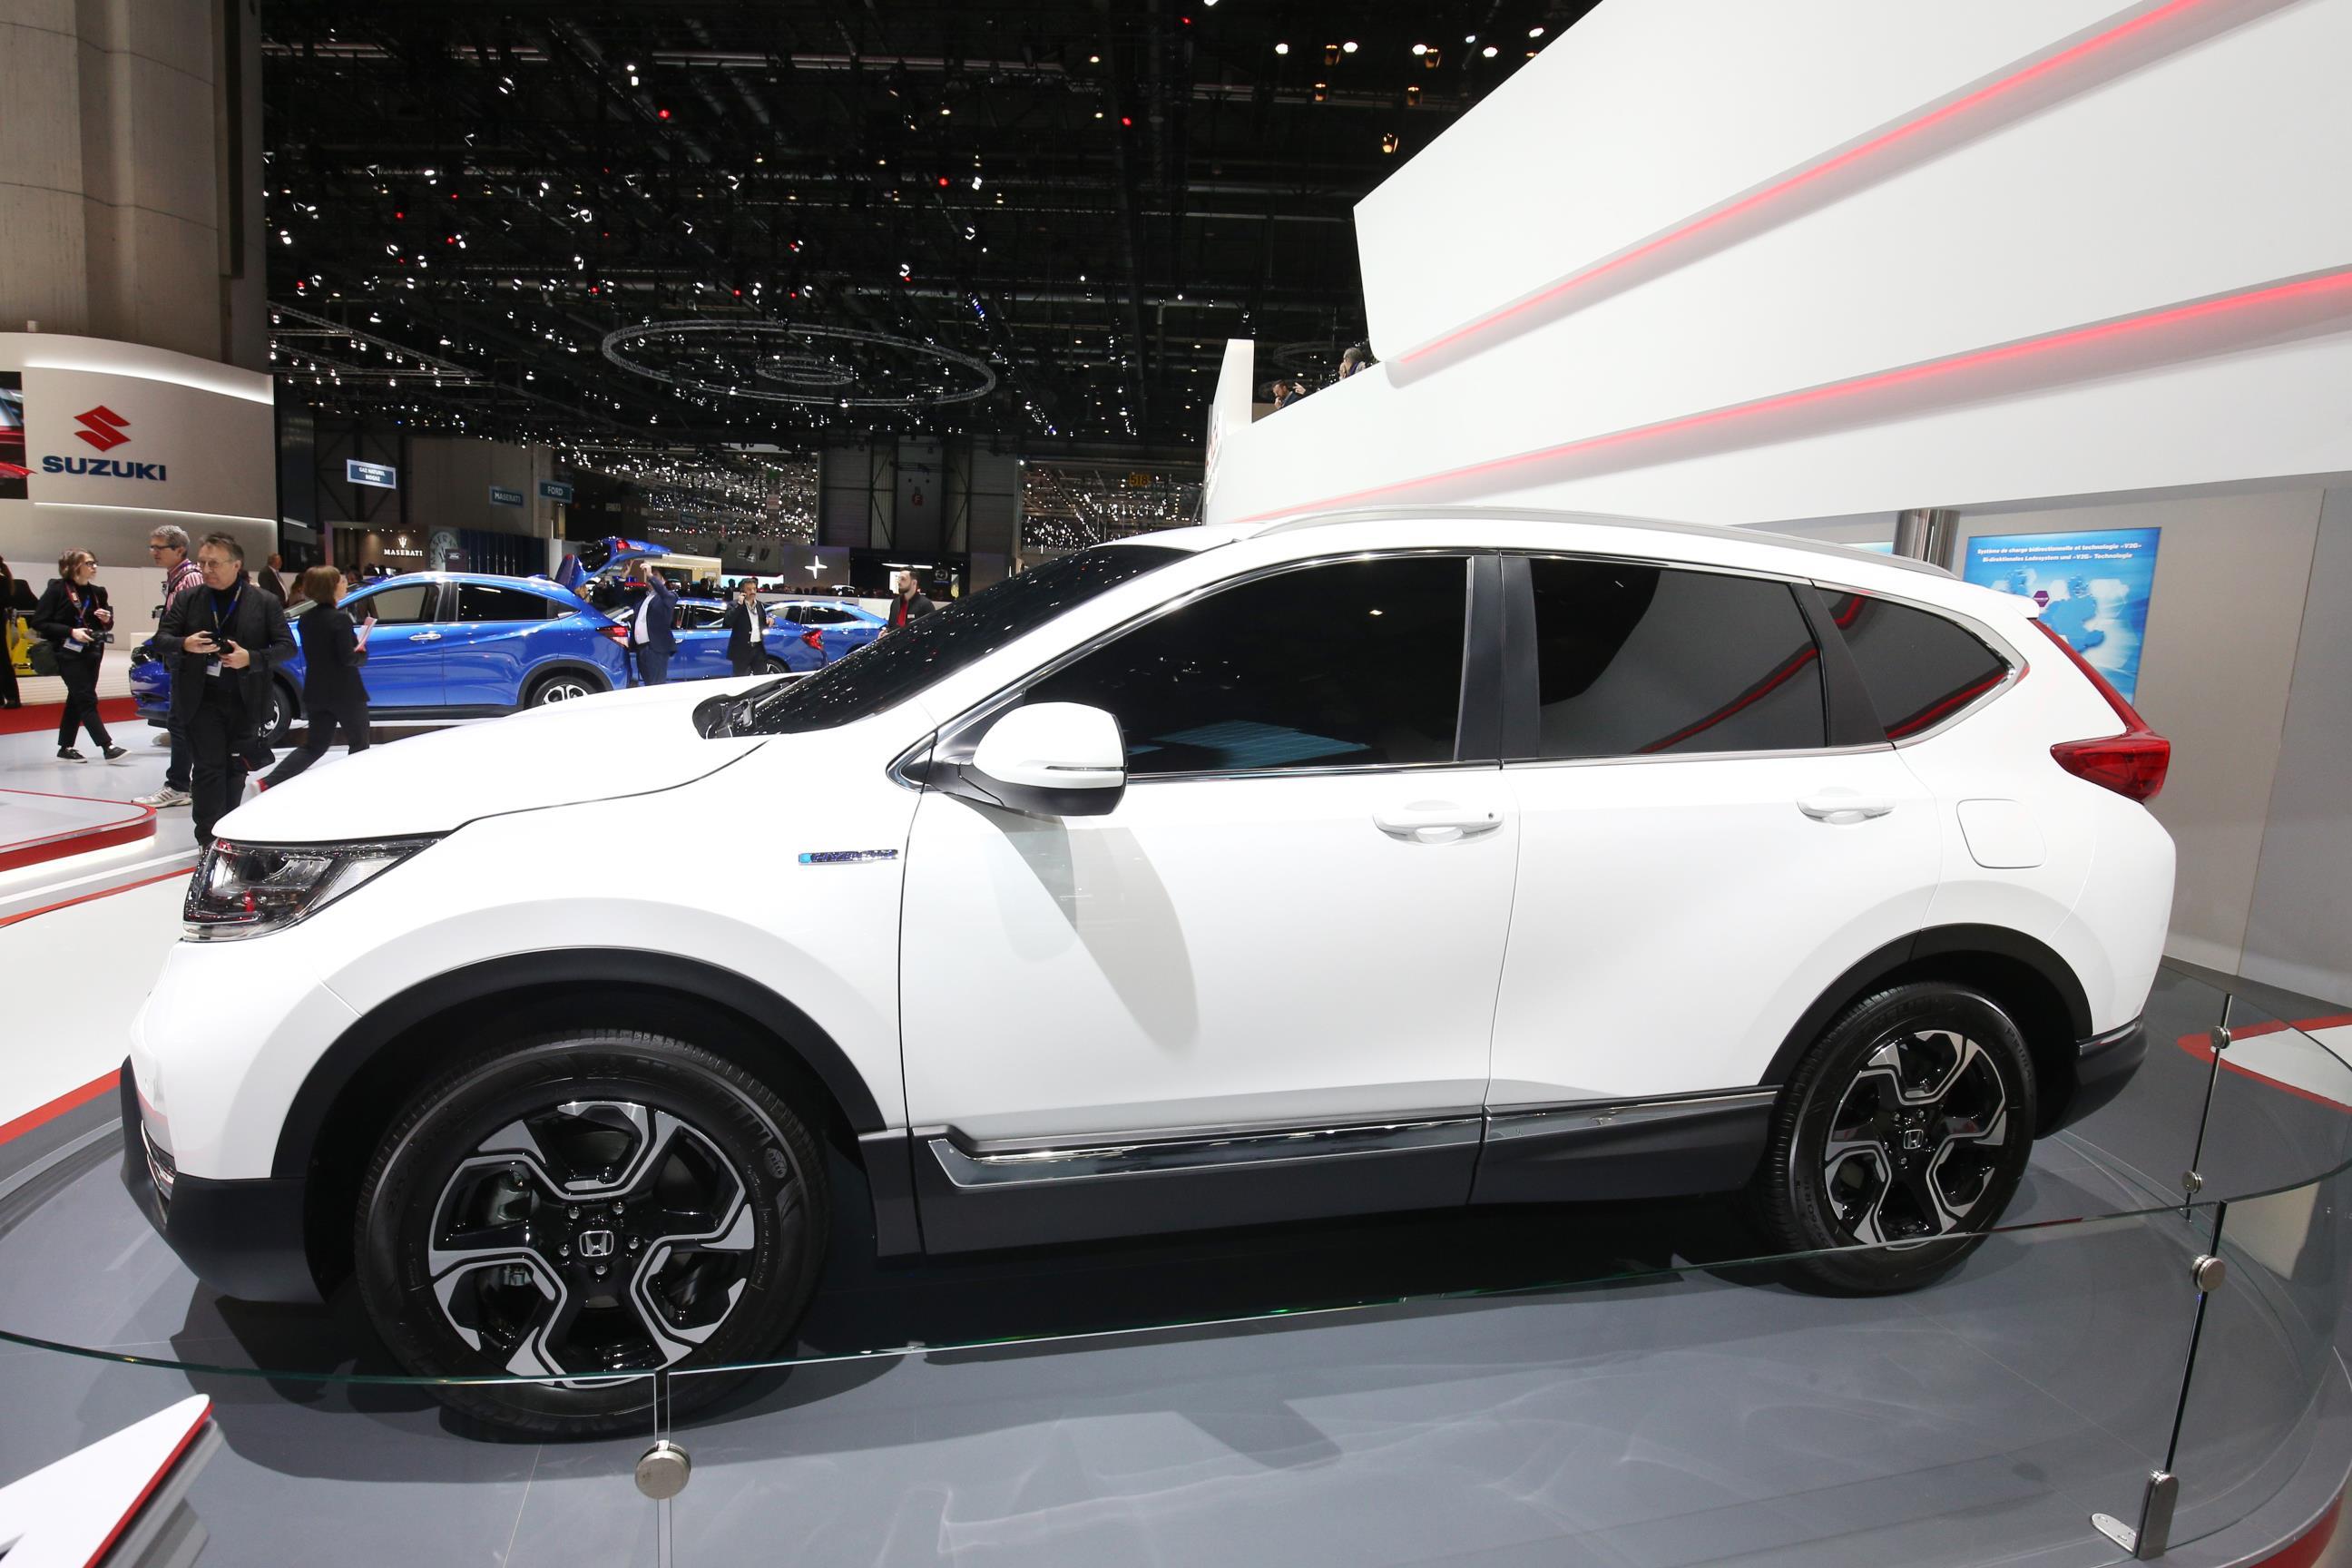 The new Honda CR-V debuts at Geneva Motor Show